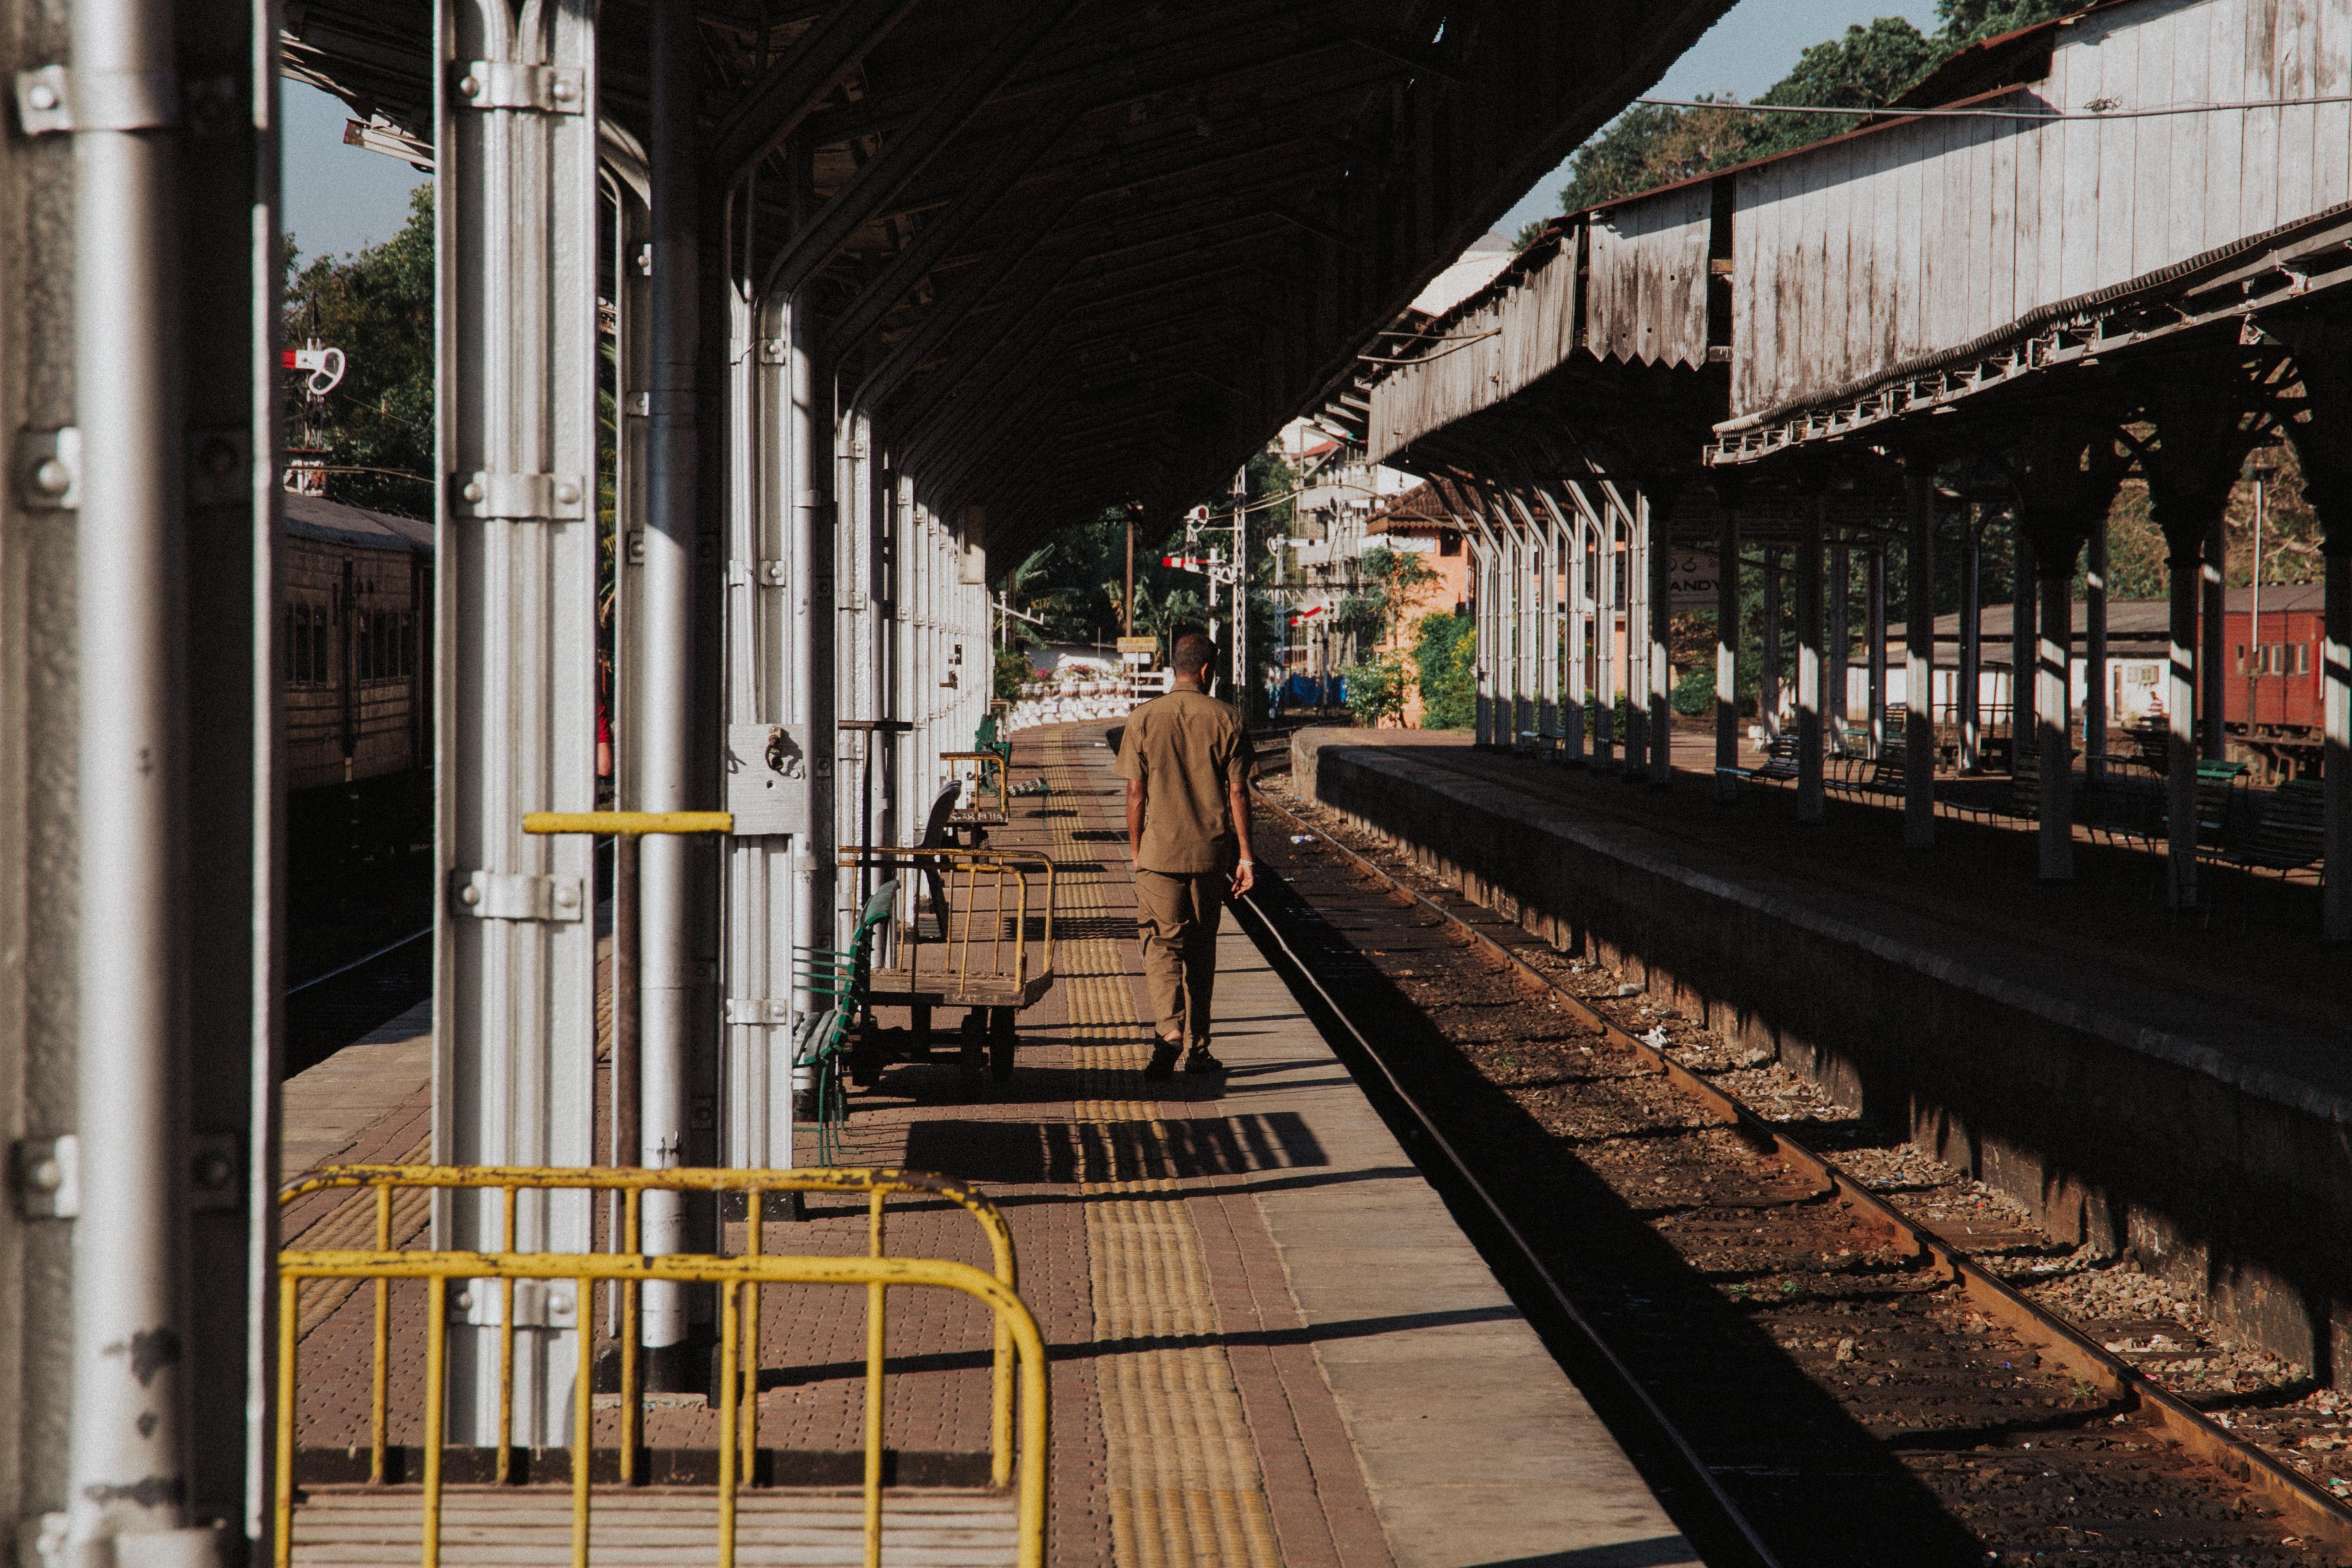 Kandy Railway station